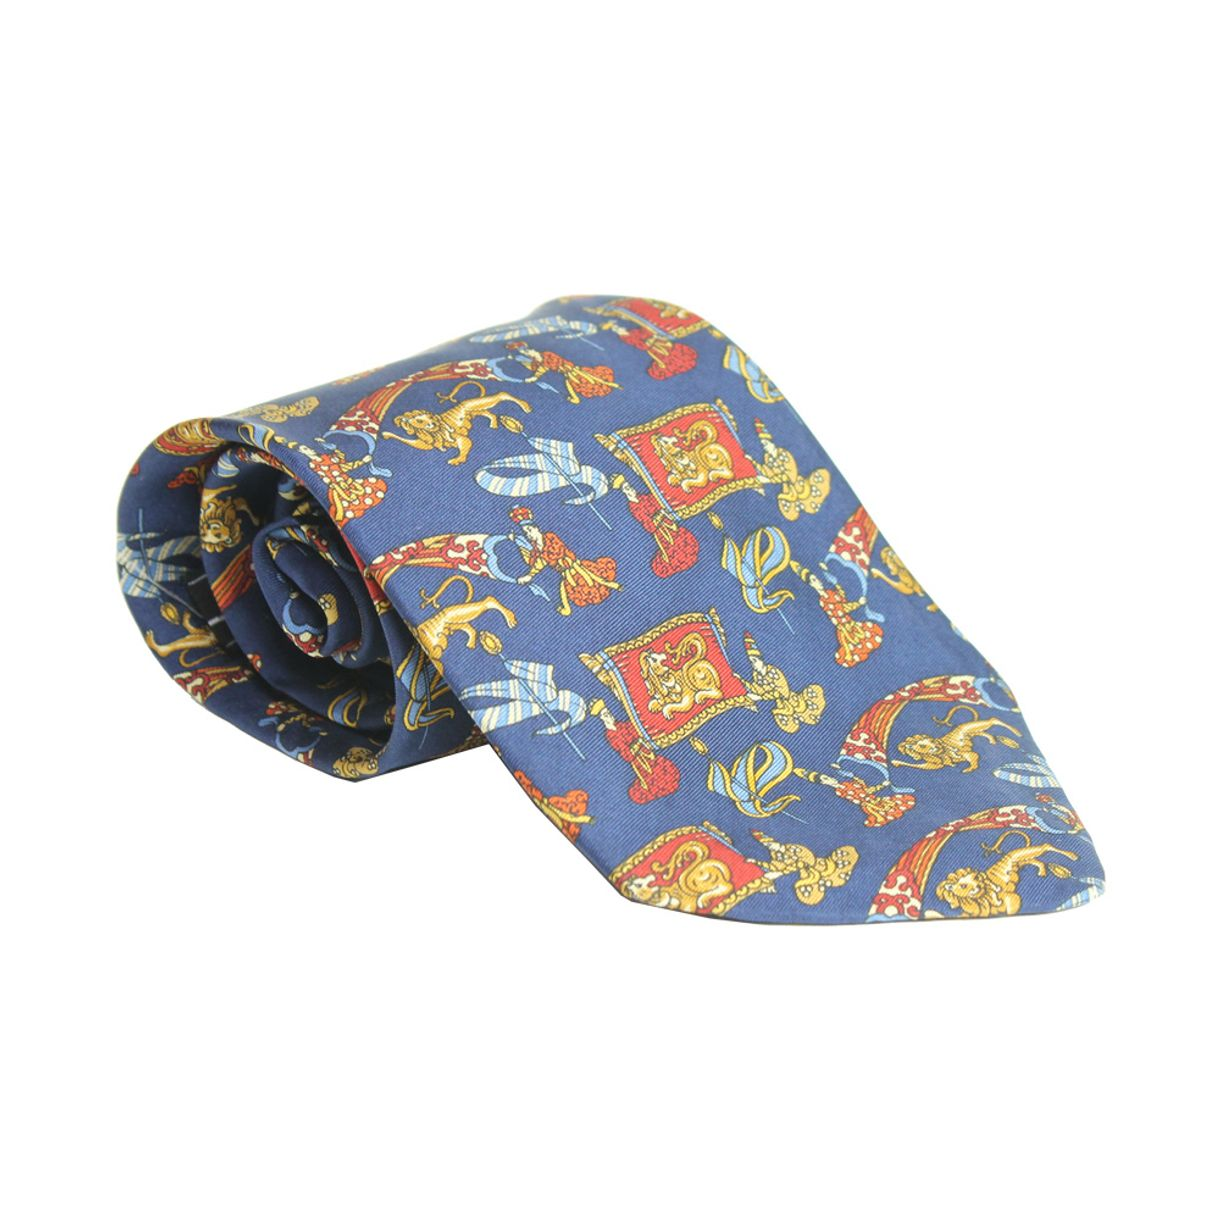 gravata-salvatore-ferragamo-leoes-azul-marinho